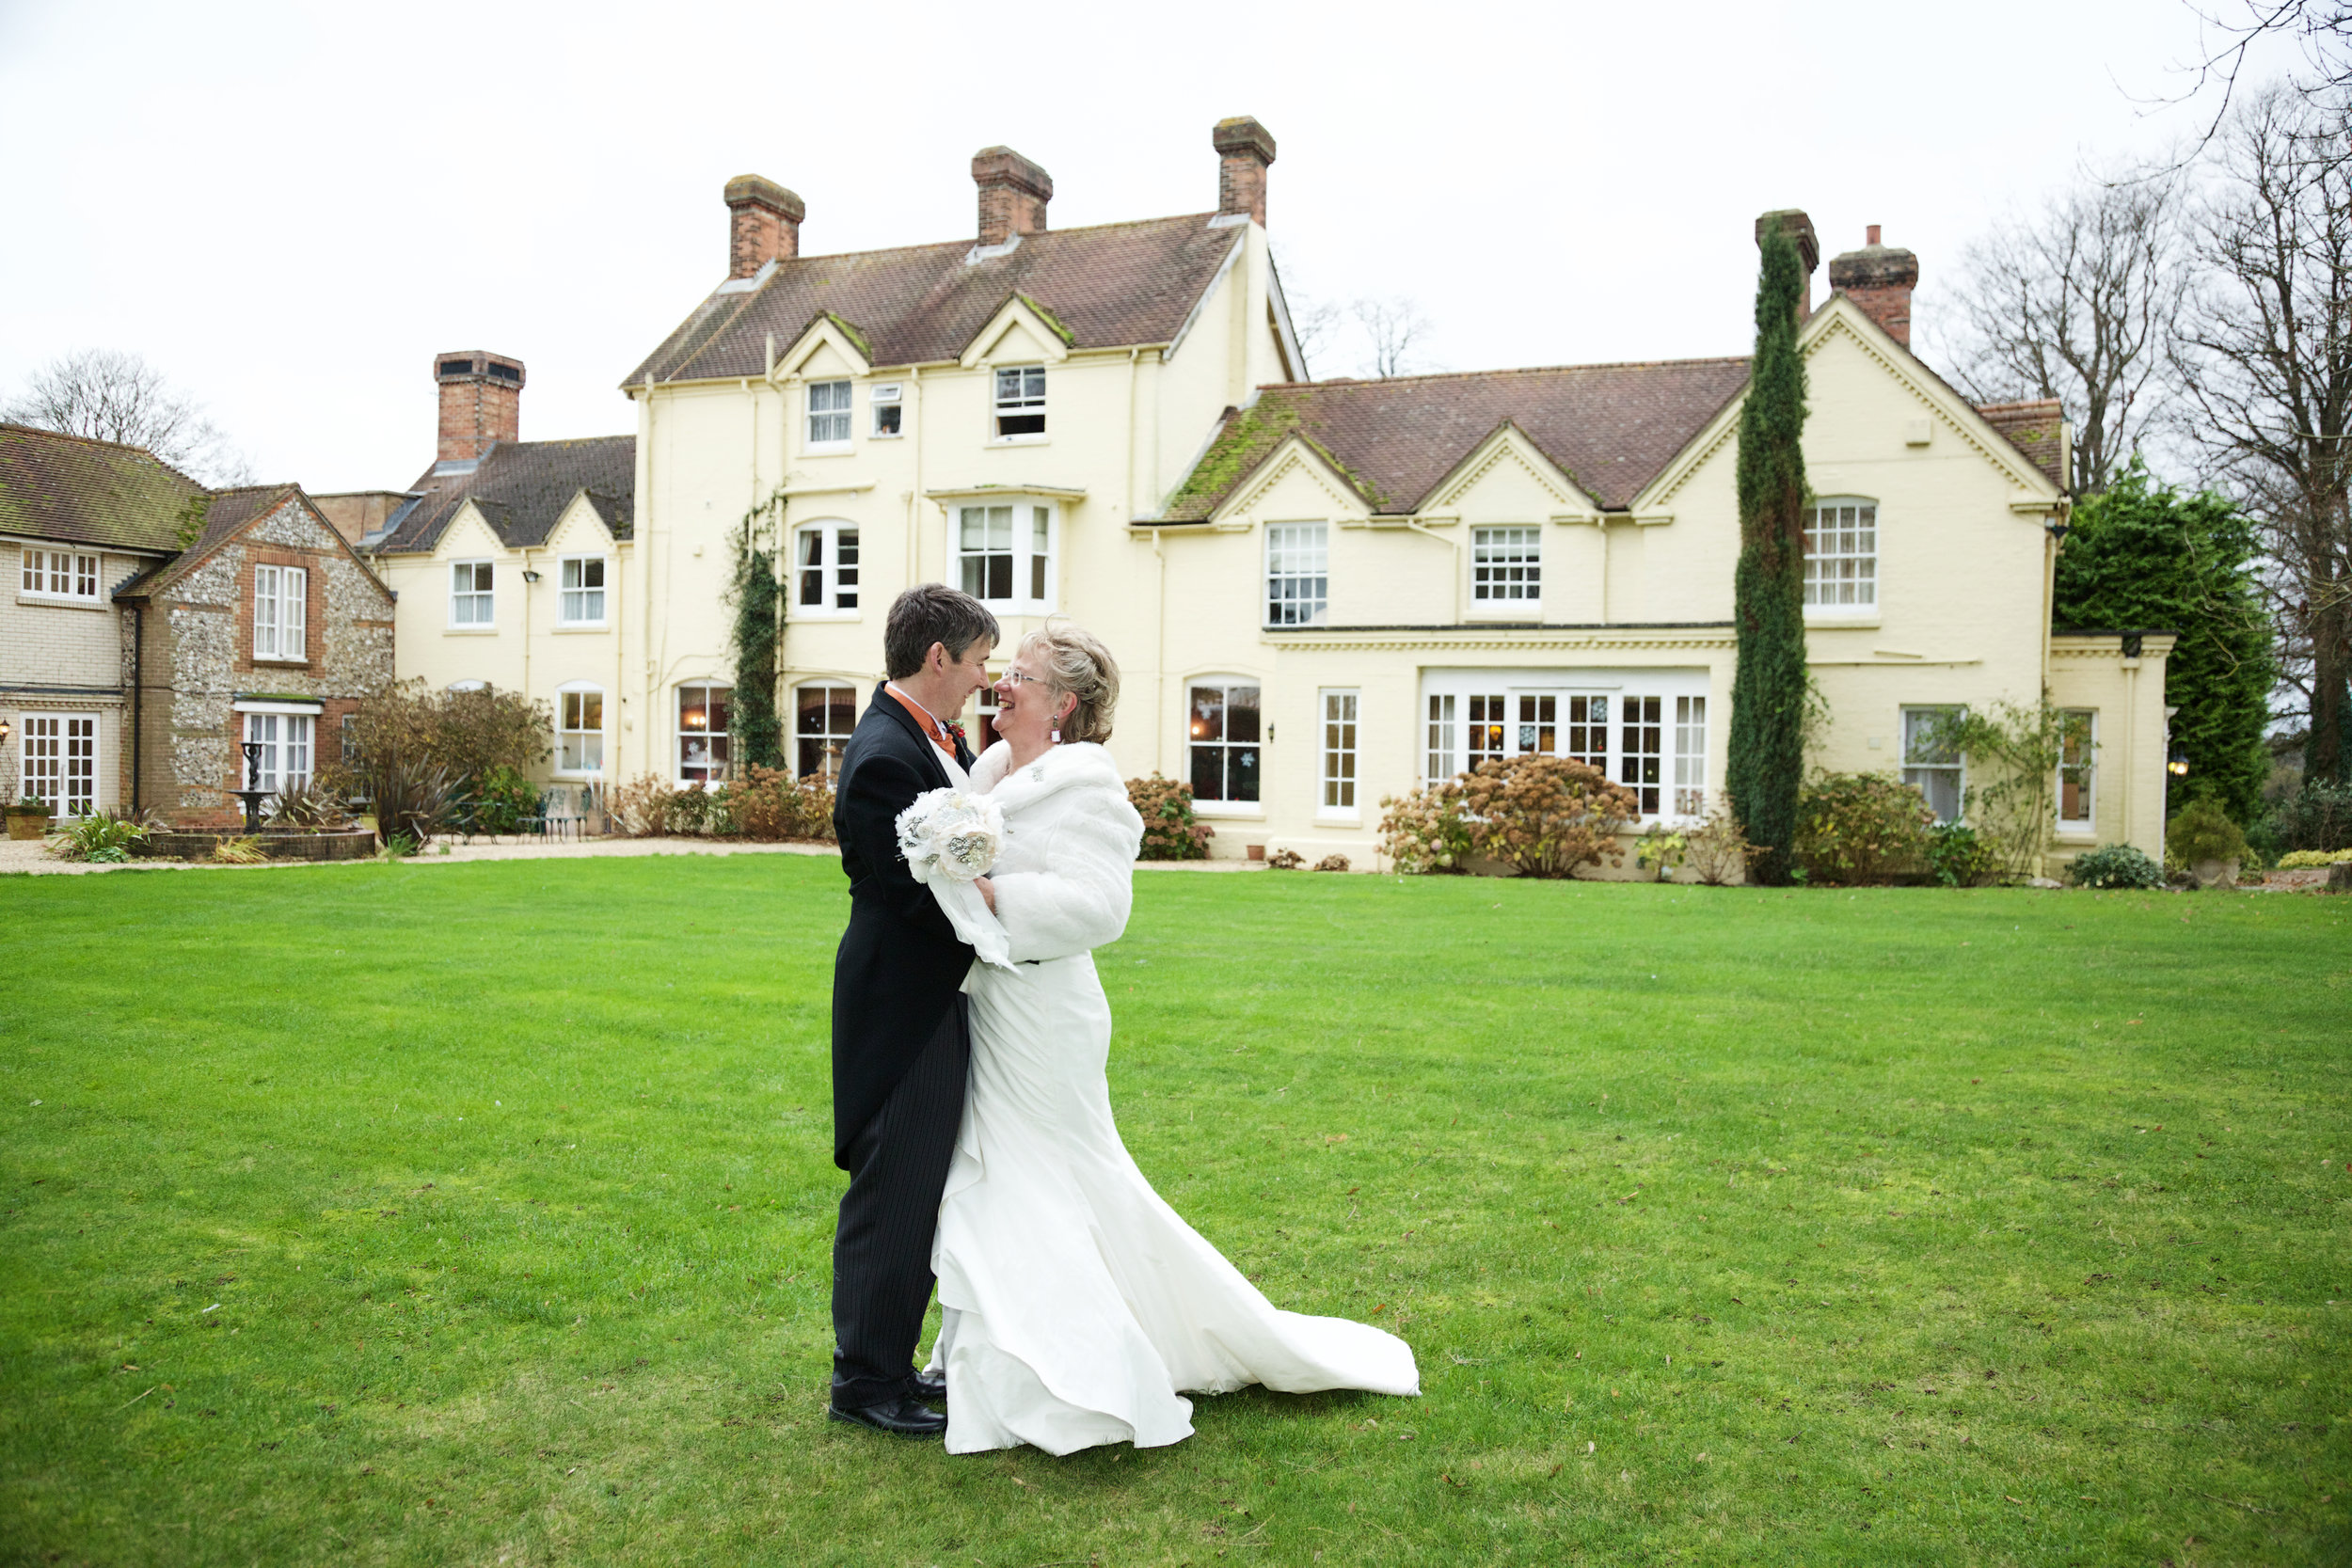 Esseborne_Manor_Wedding_Photographer_Andover_026.jpg